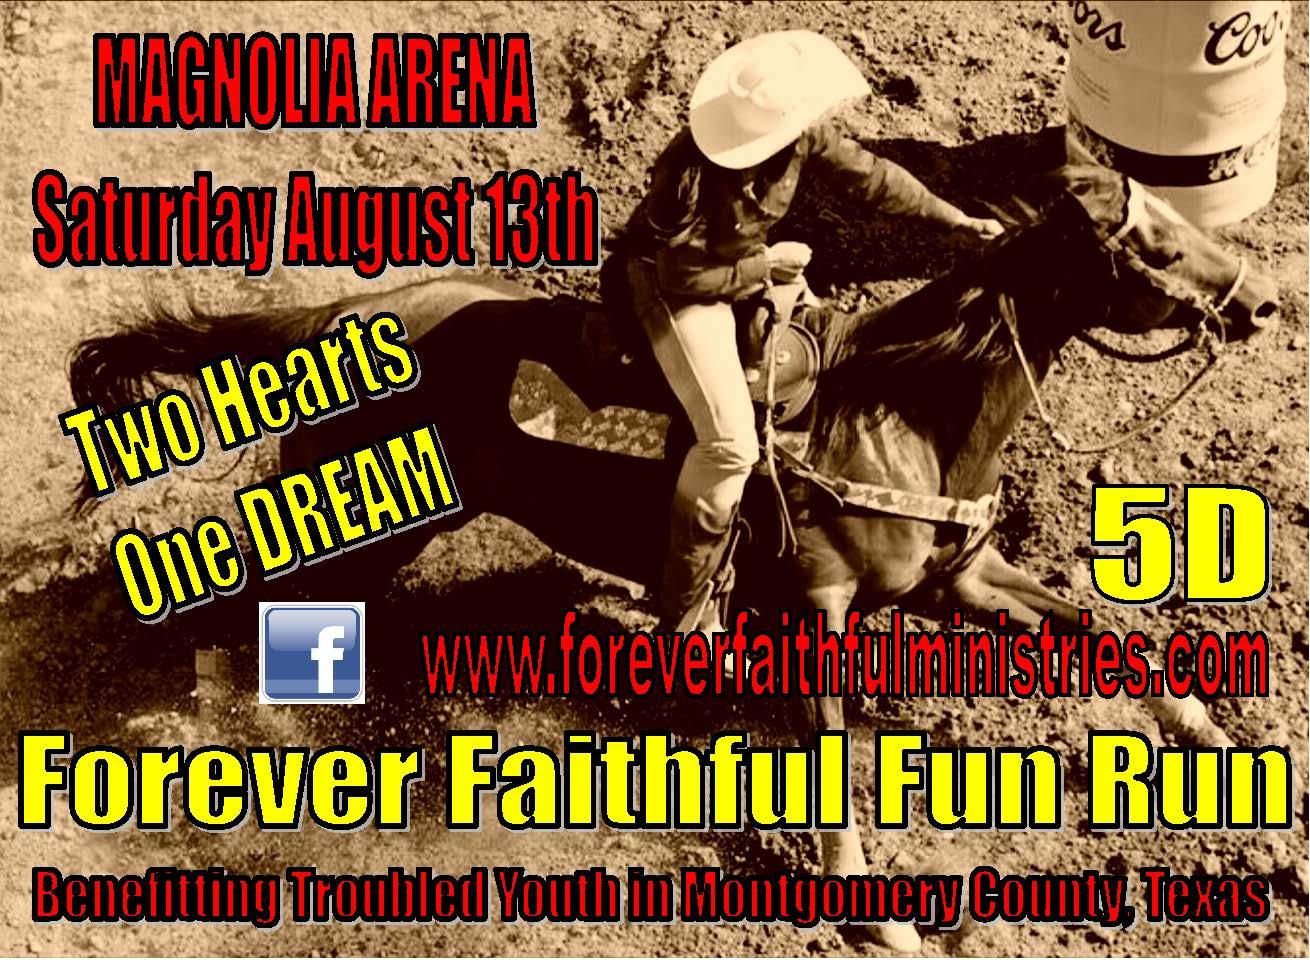 Forever Faithful Fun Run